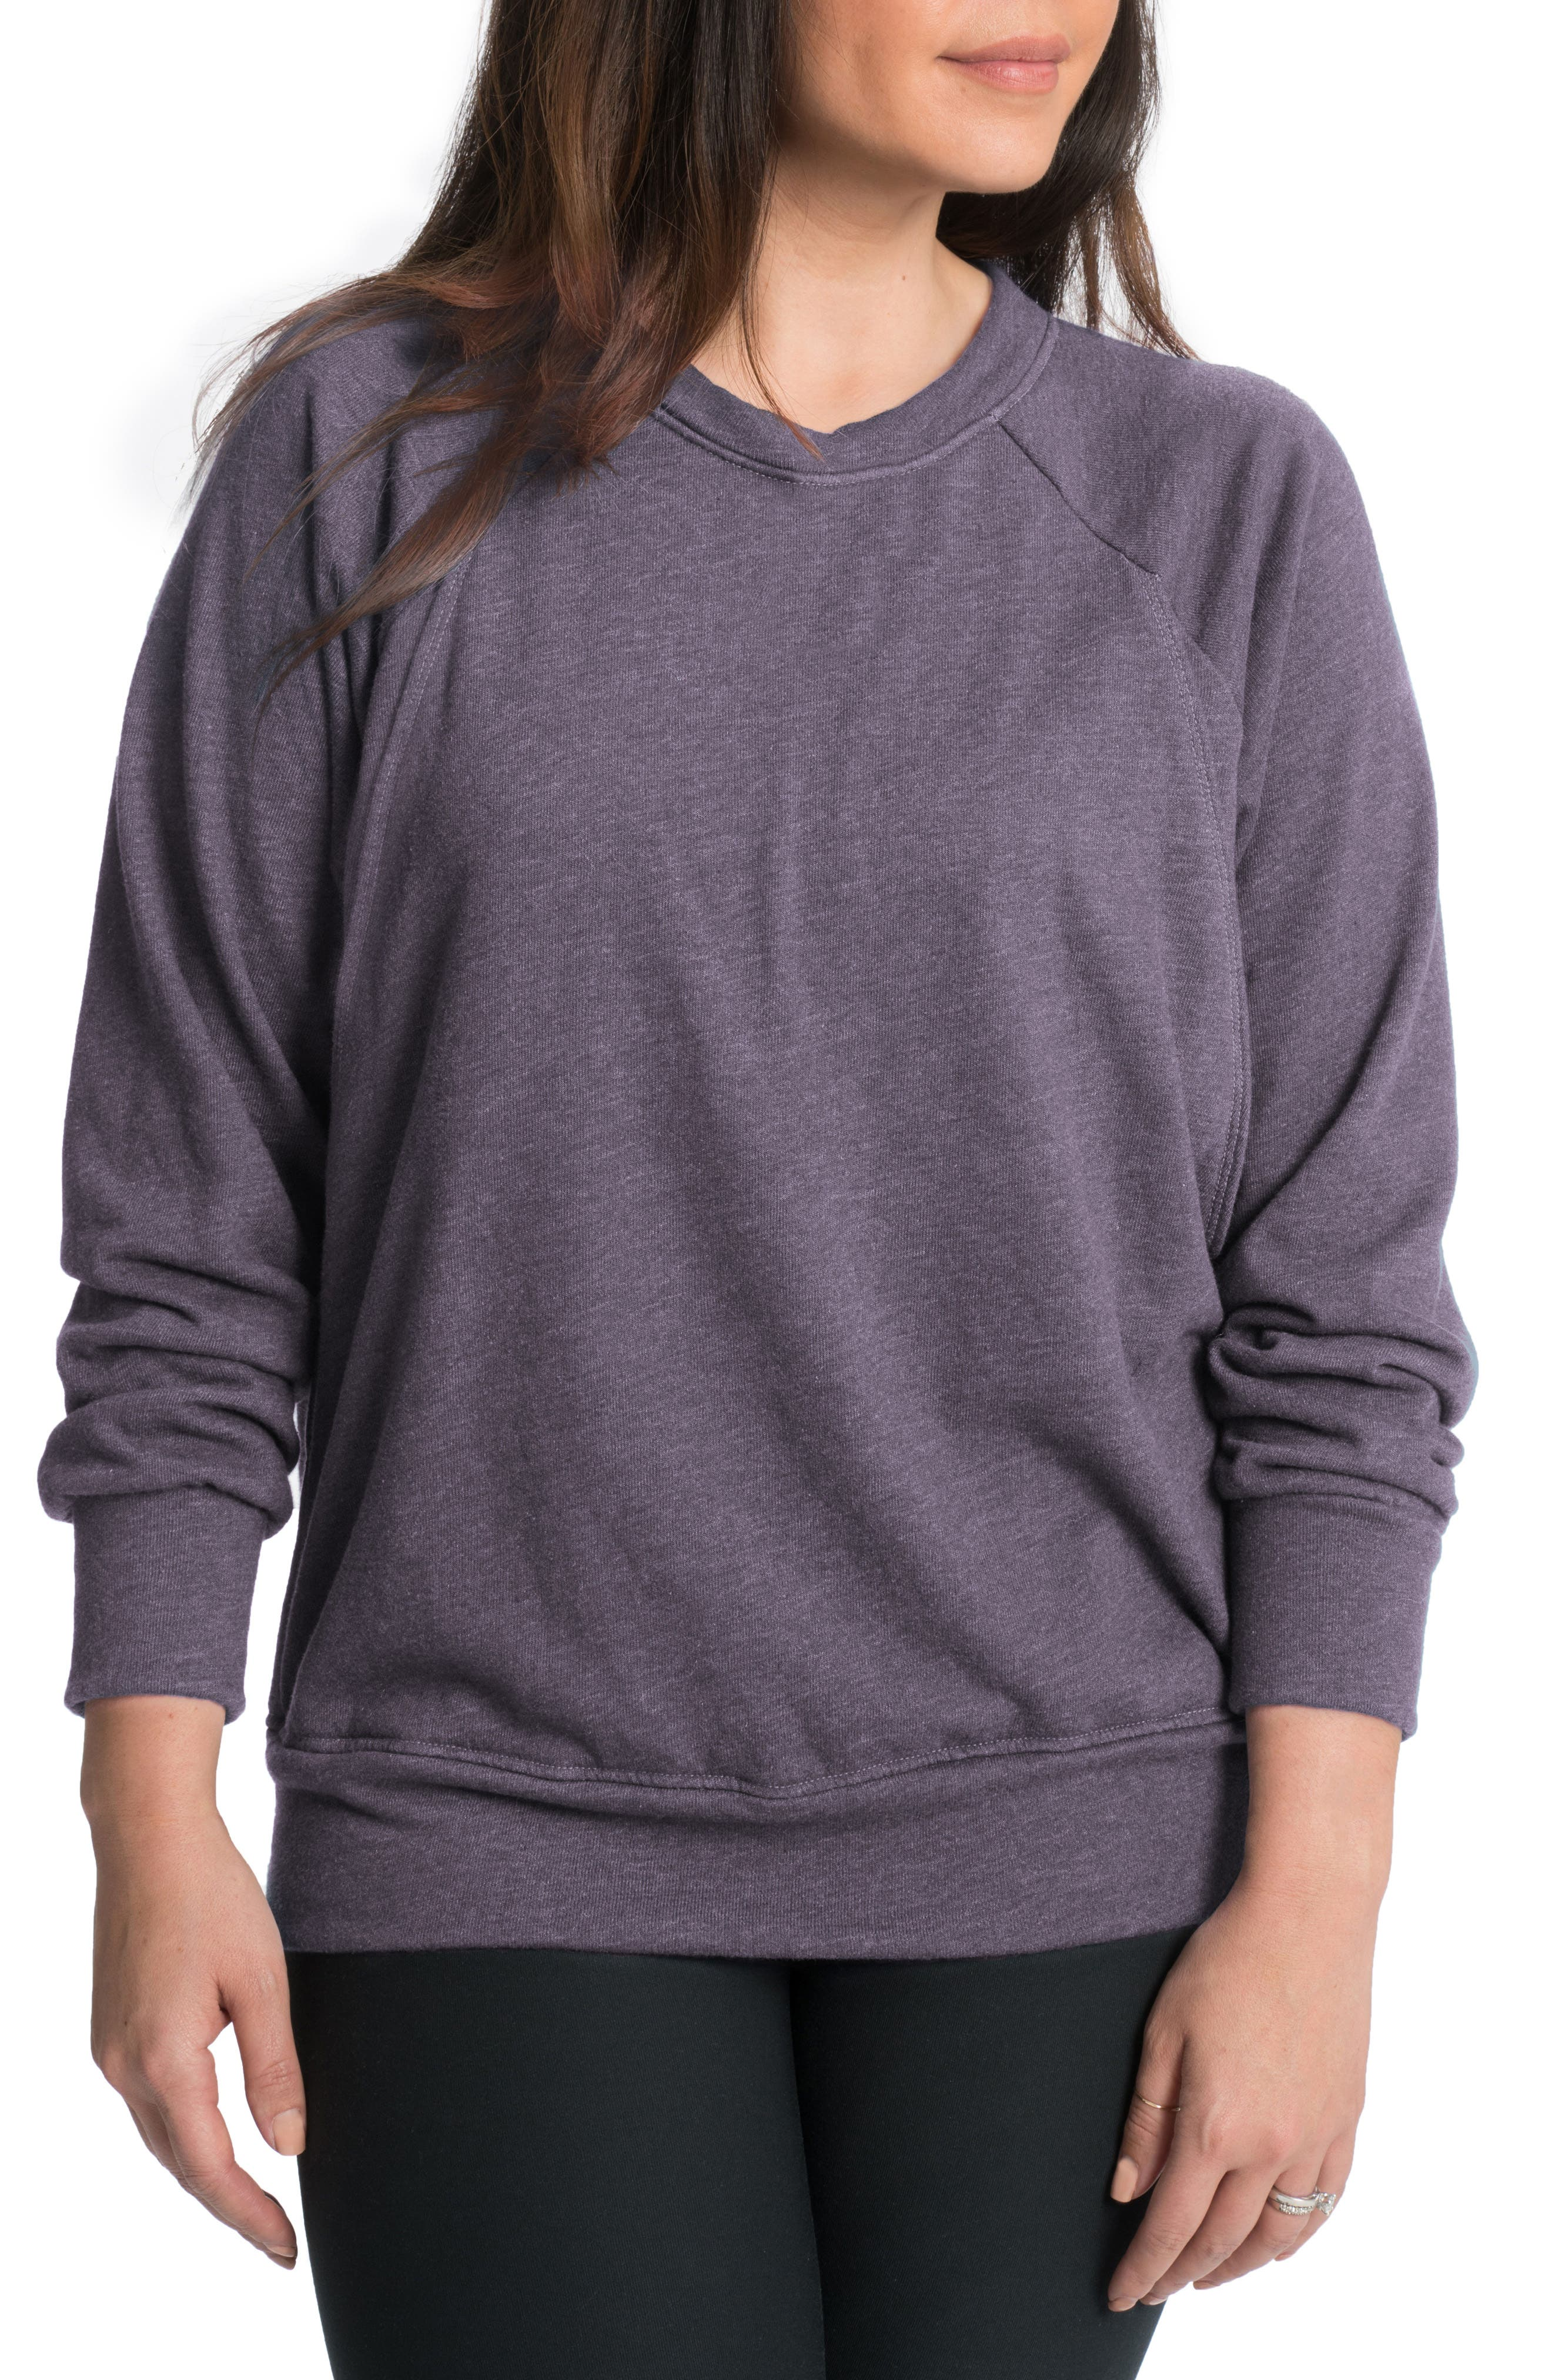 Bun Maternity Relaxed Daily Maternity/Nursing Sweatshirt